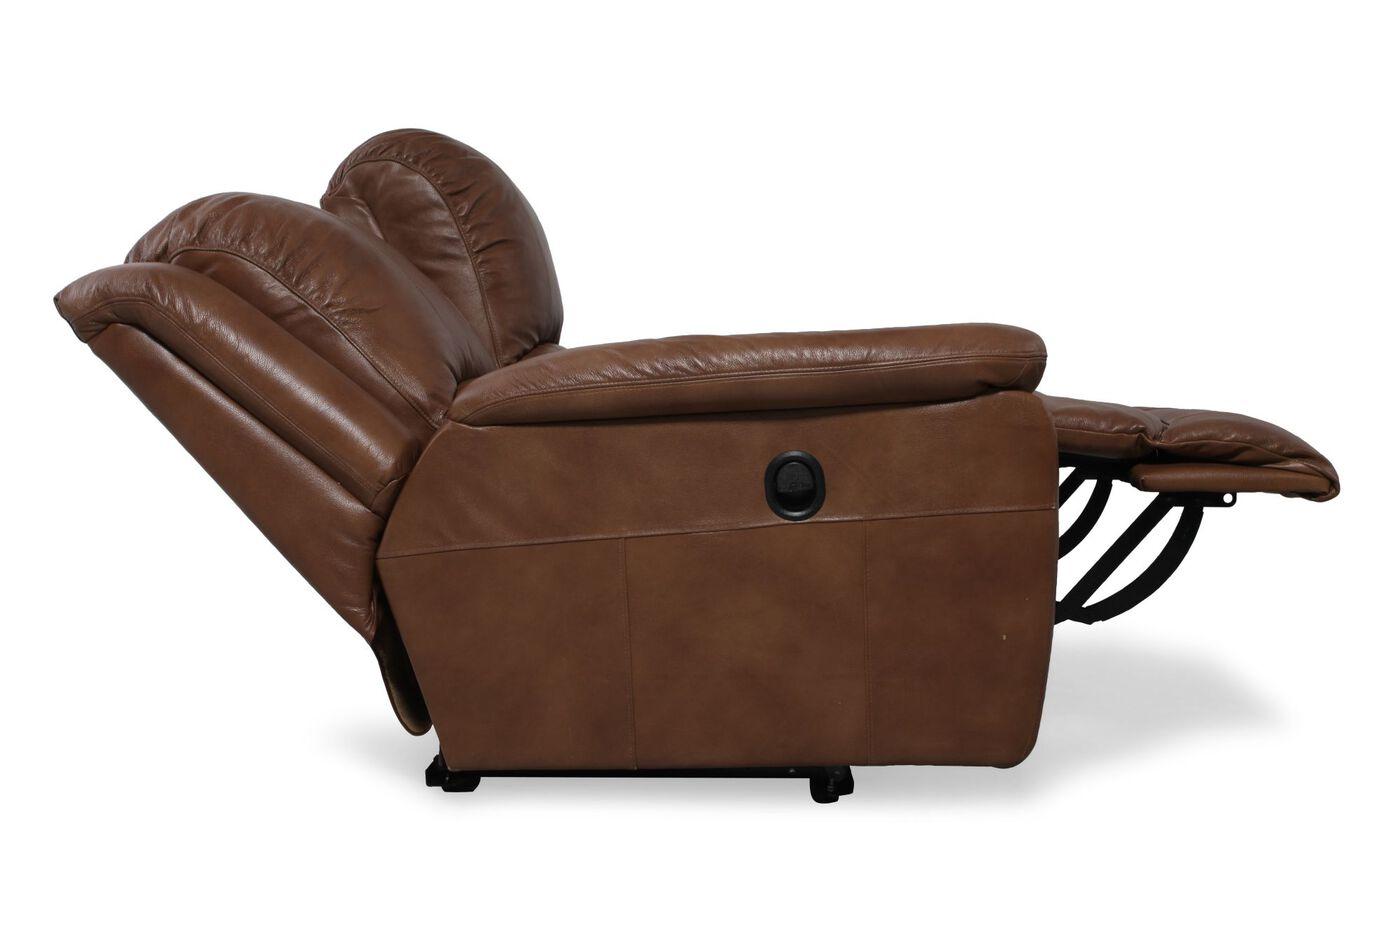 85 Inch Leather Sofa.85\